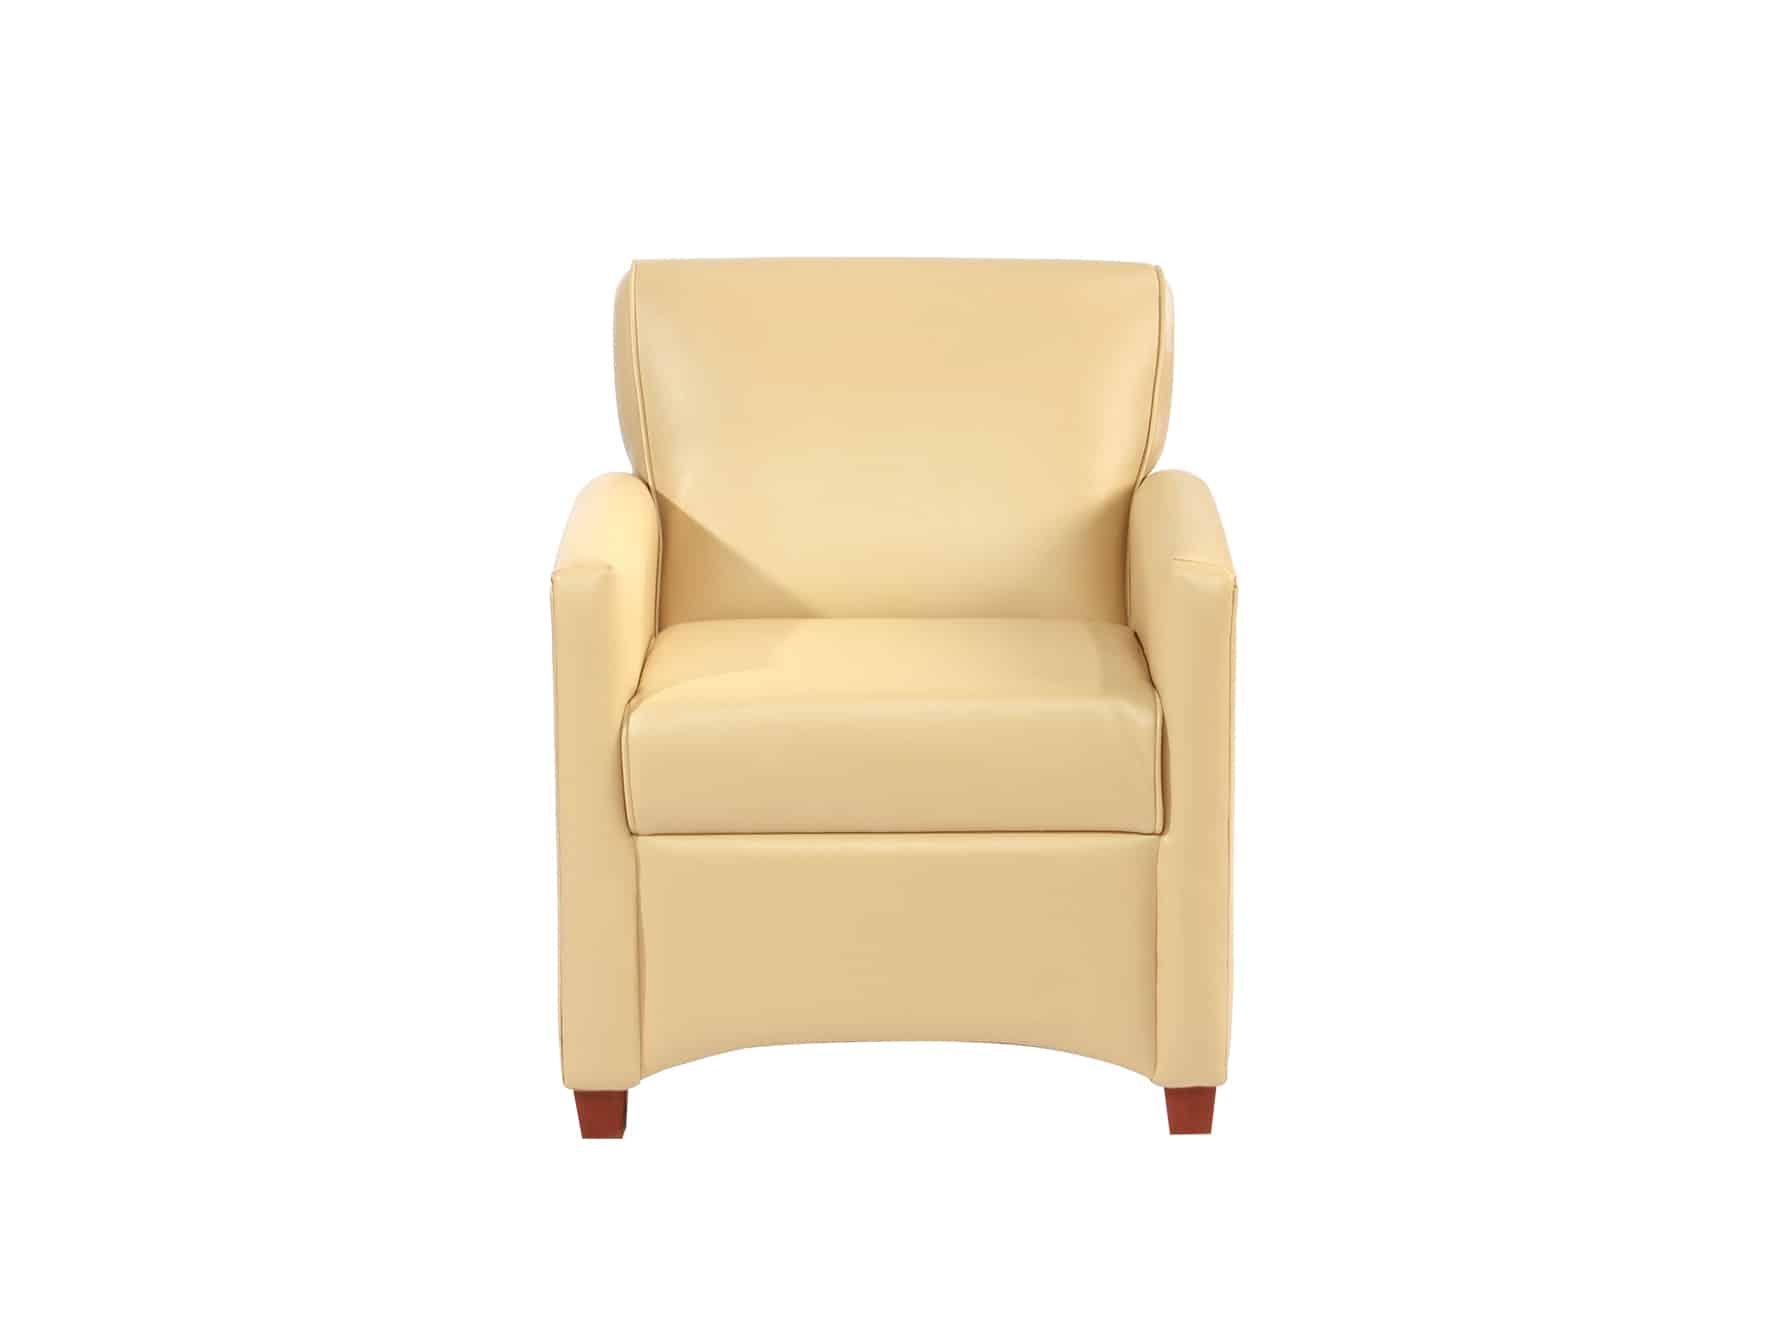 lobby sofa crossword rattan cover madison chair sauder education